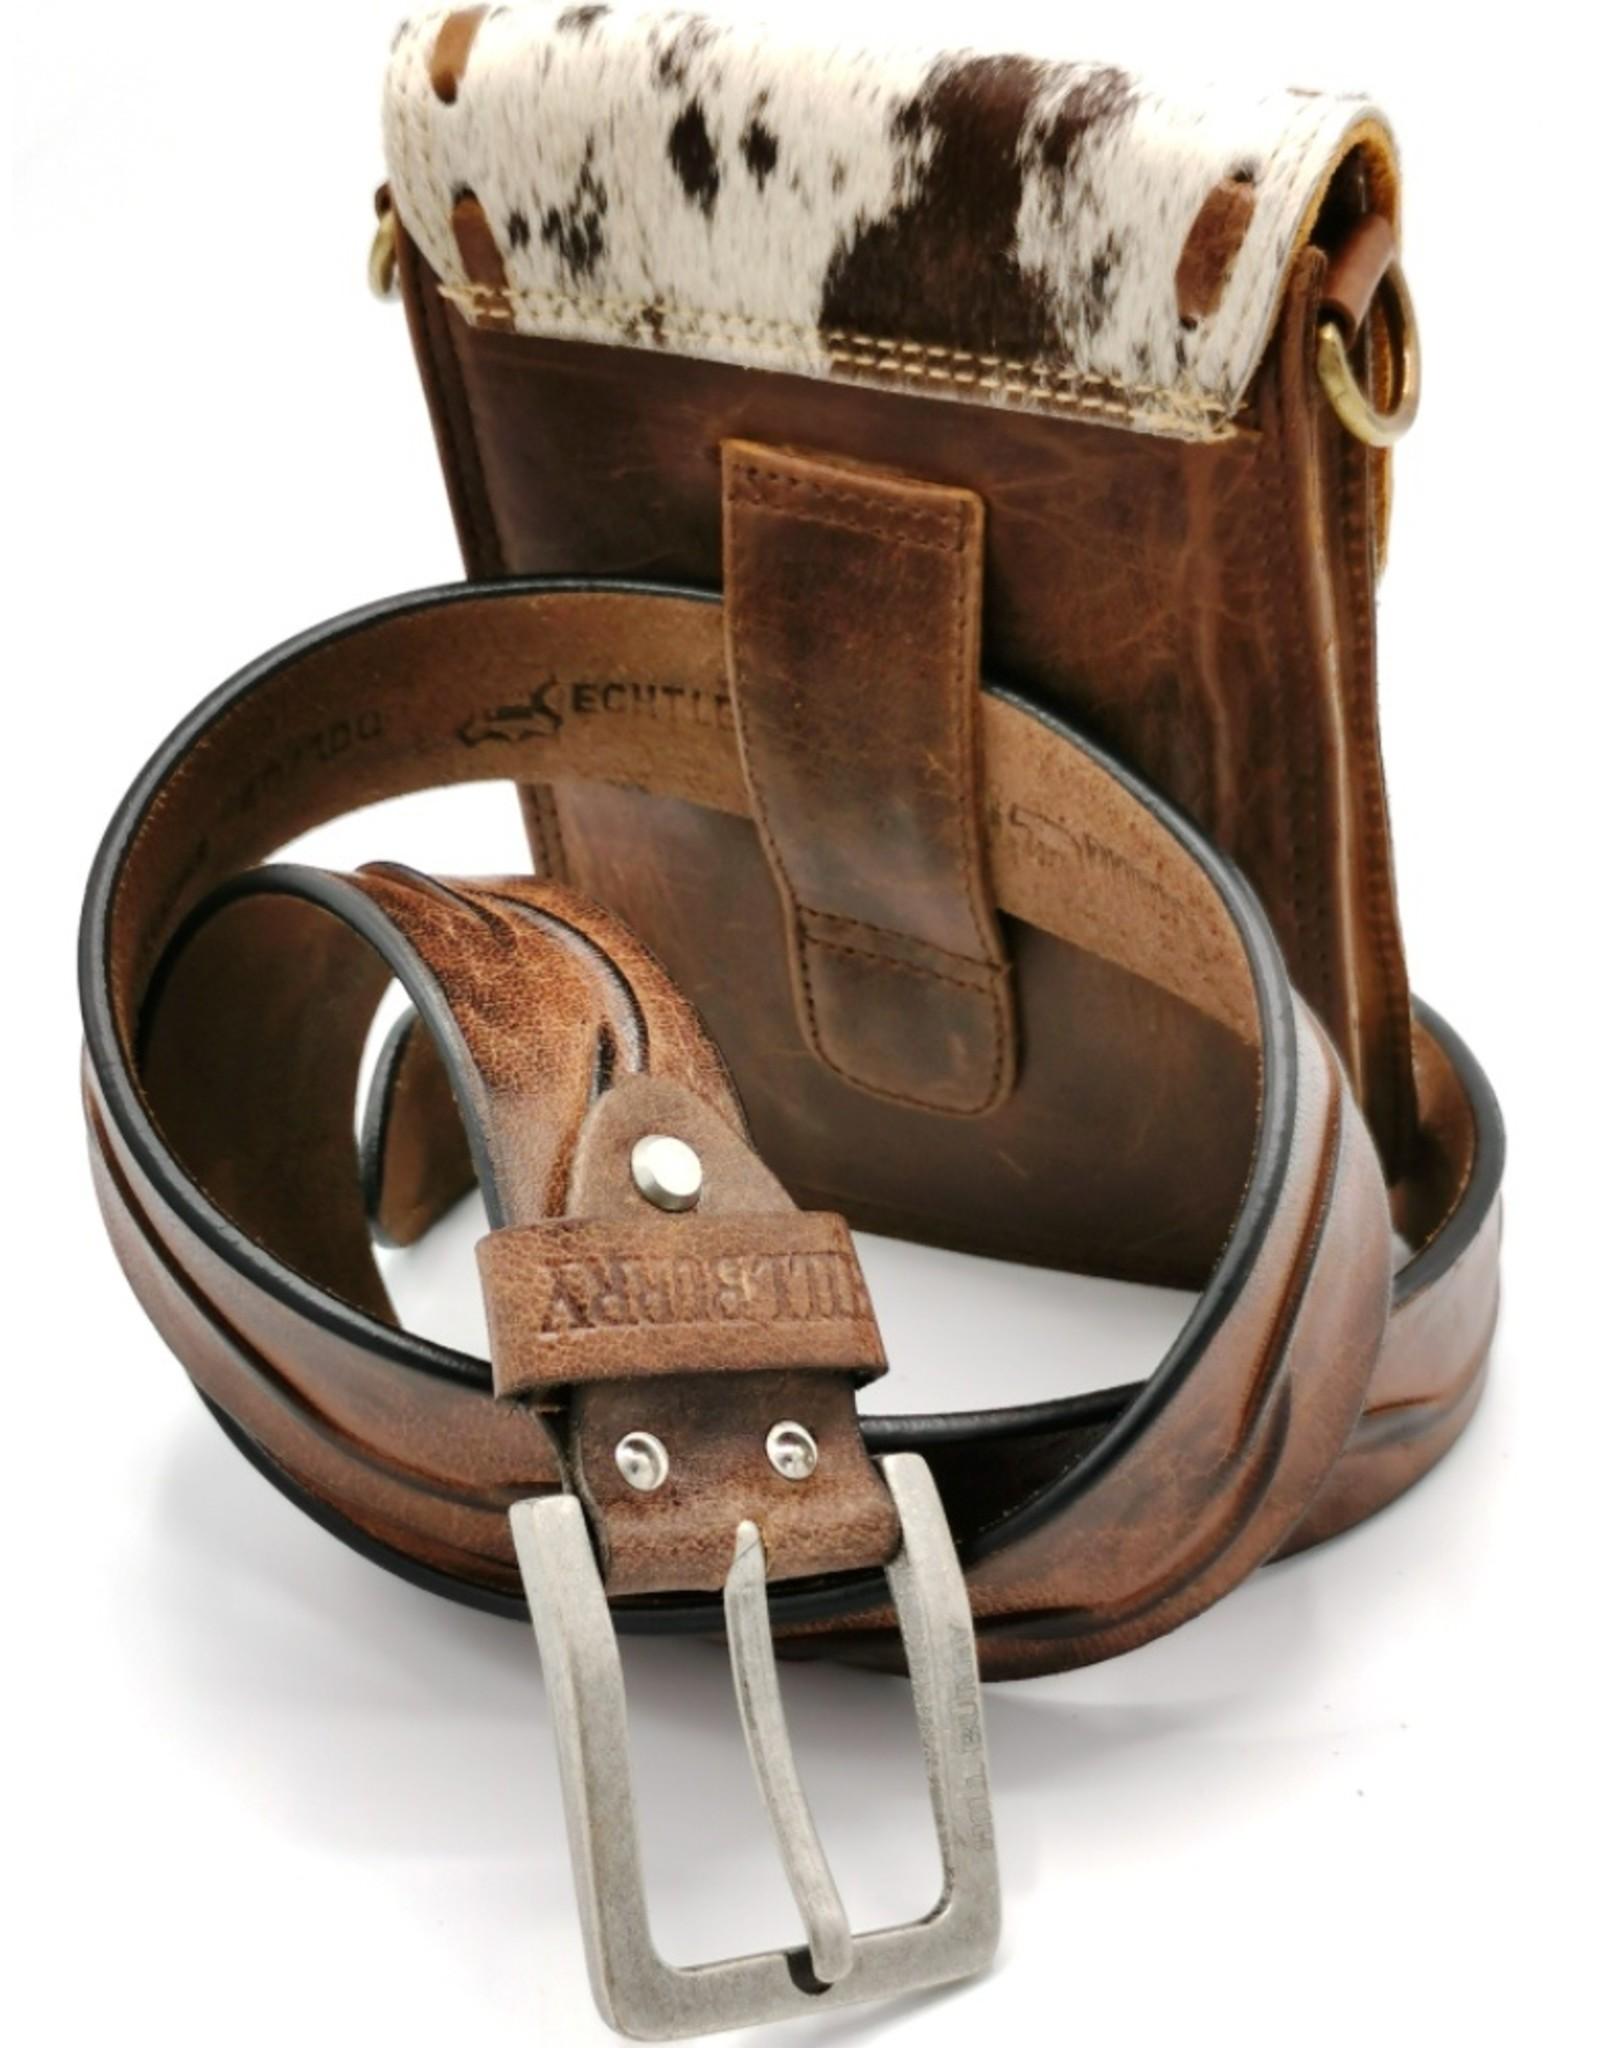 Heuptas-festivaltasje-koeienhuid Leather Festival bags, waist bags and belt bags - Cowhide phone bag-crossbody-belt bag